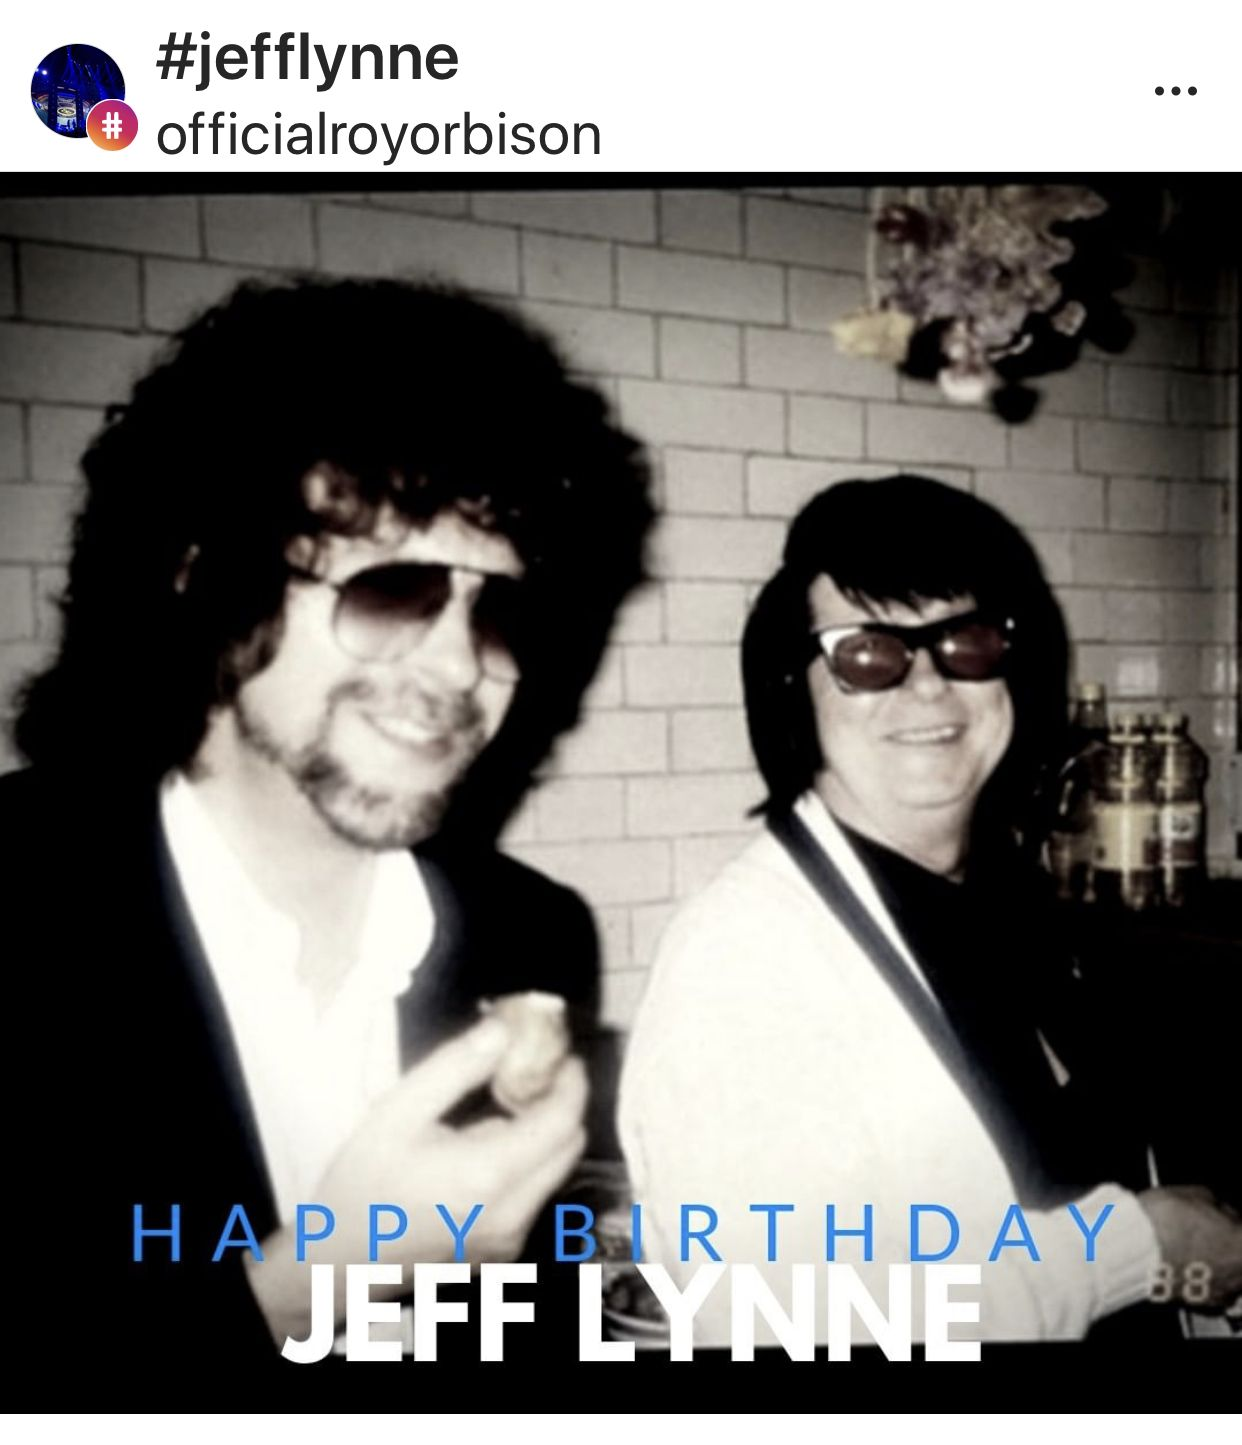 Pin na nástenke Jeff Lynne solo